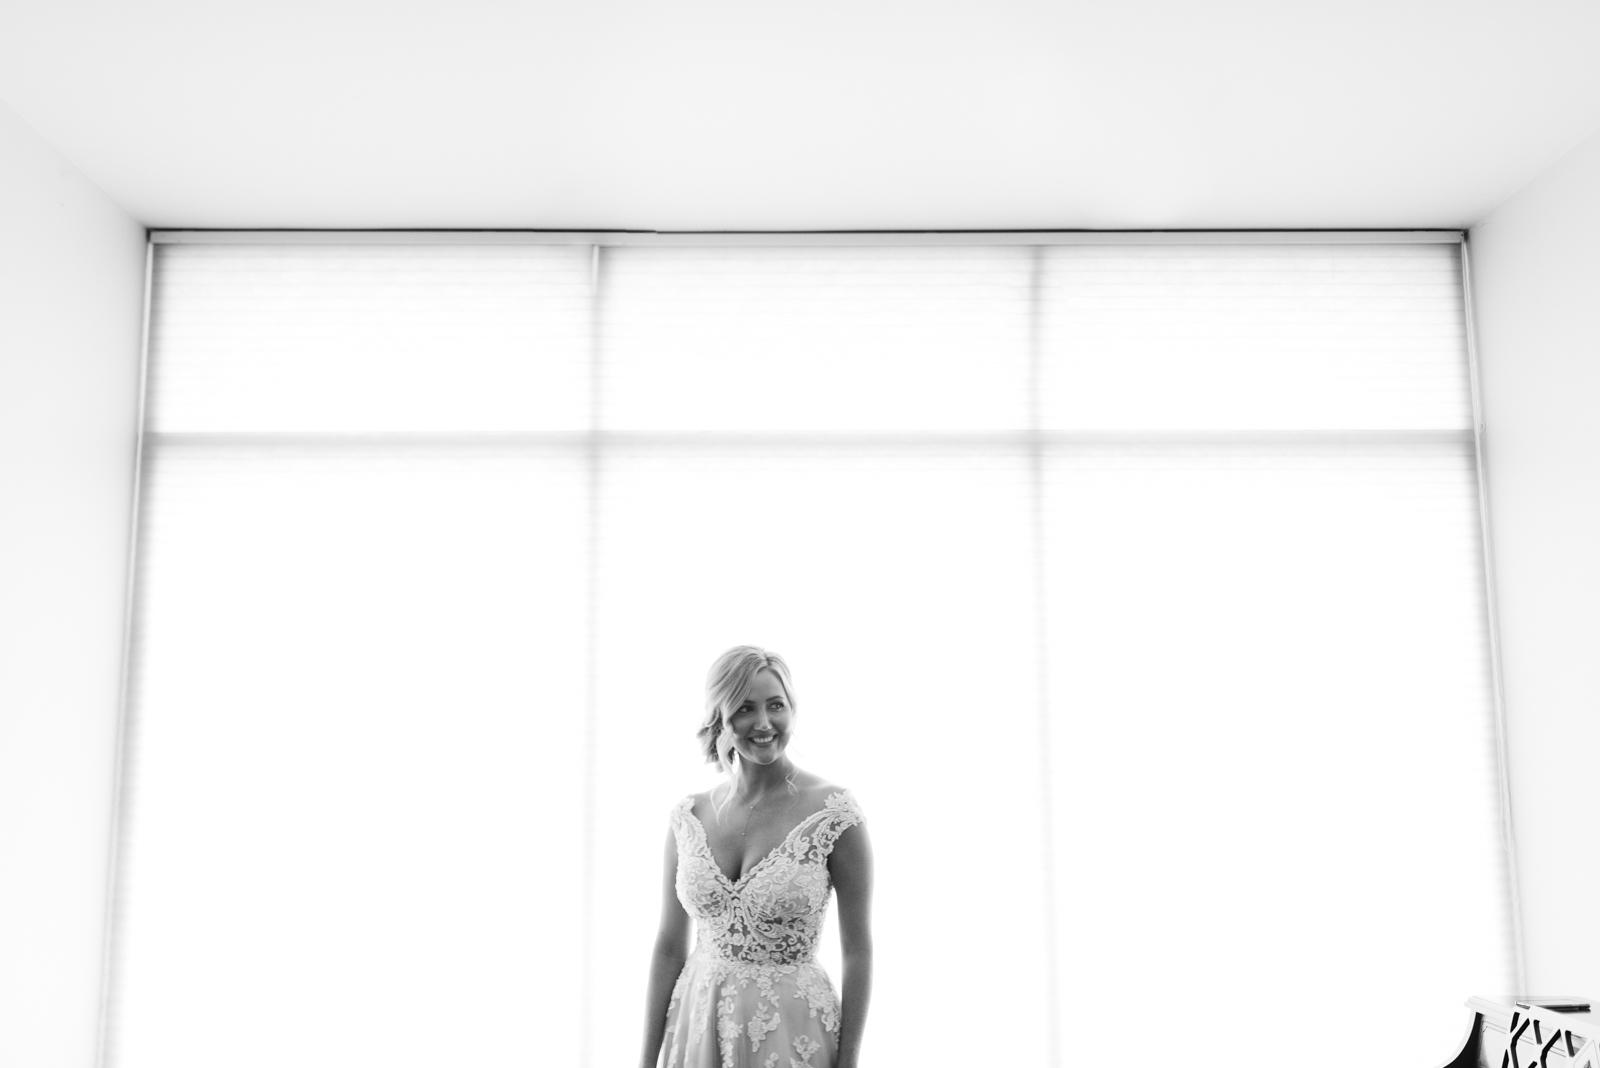 bride in front of large windows St. John XXIII Parish wedding